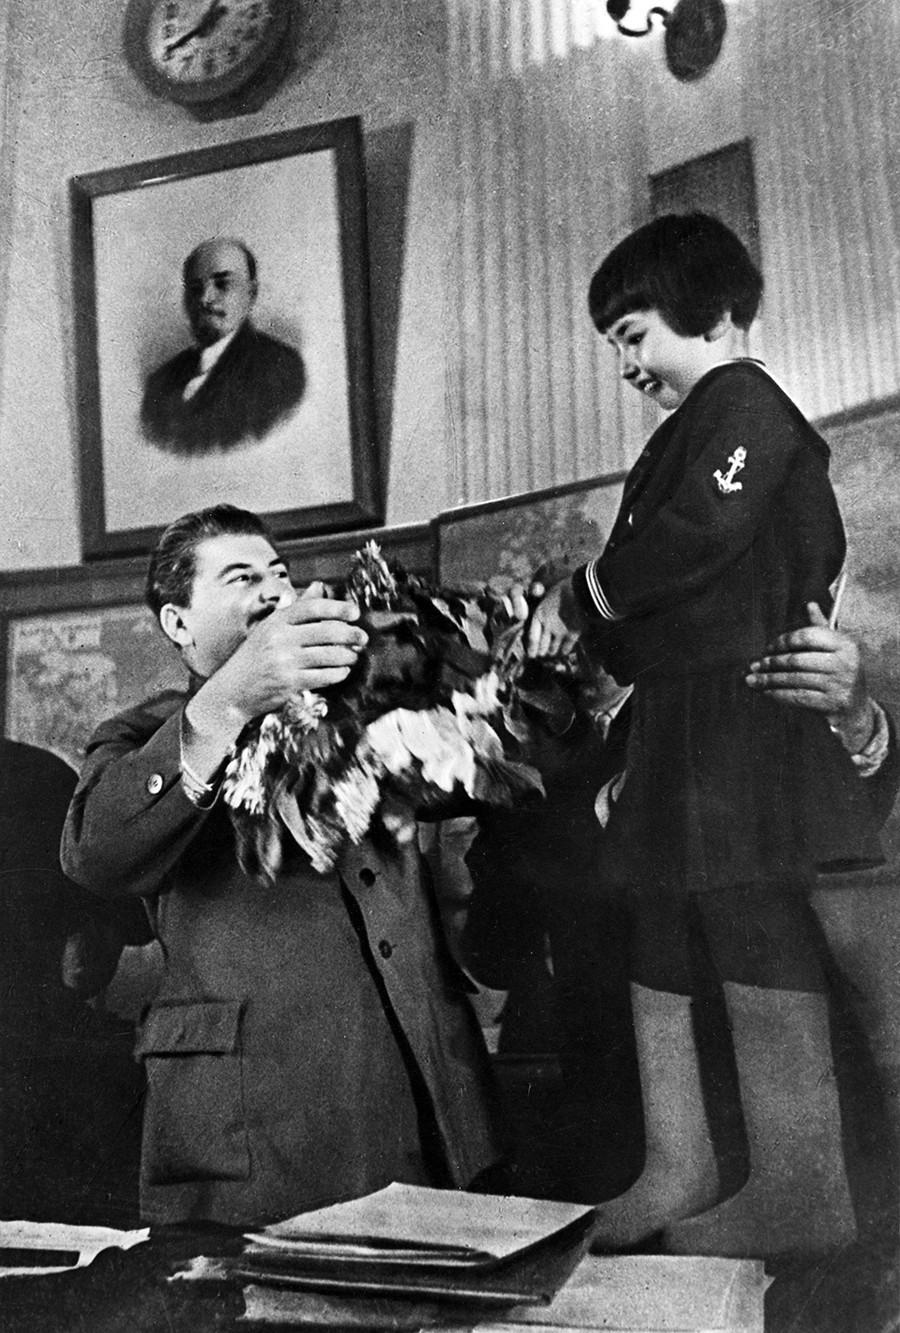 Ióssif Stálin recebe buquê de flores de Engelsina (Gelia) Markizova